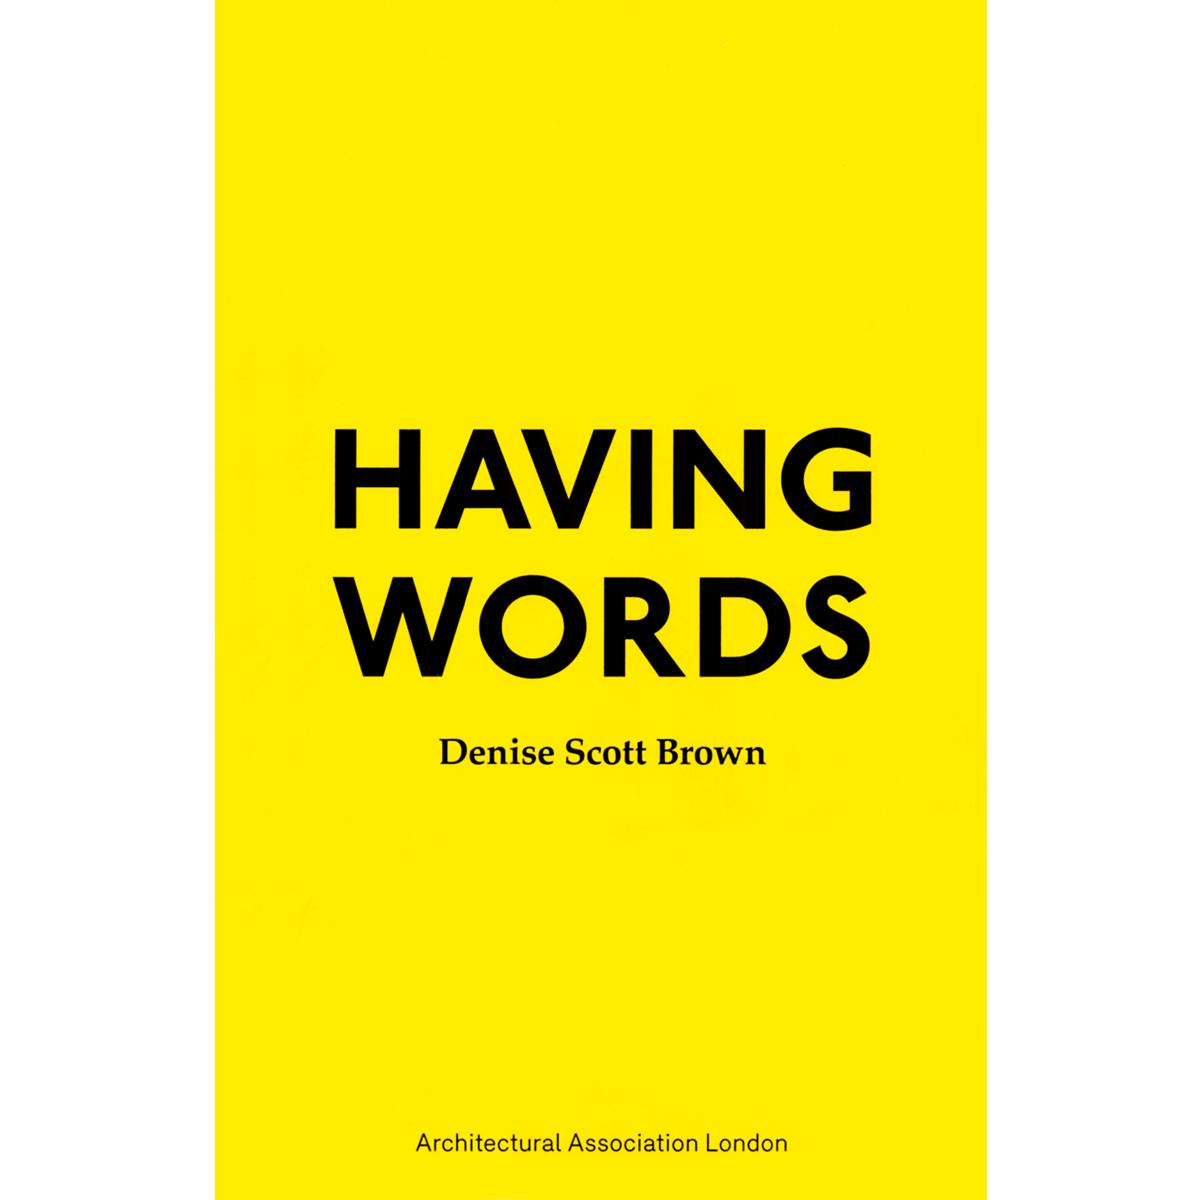 Having Words